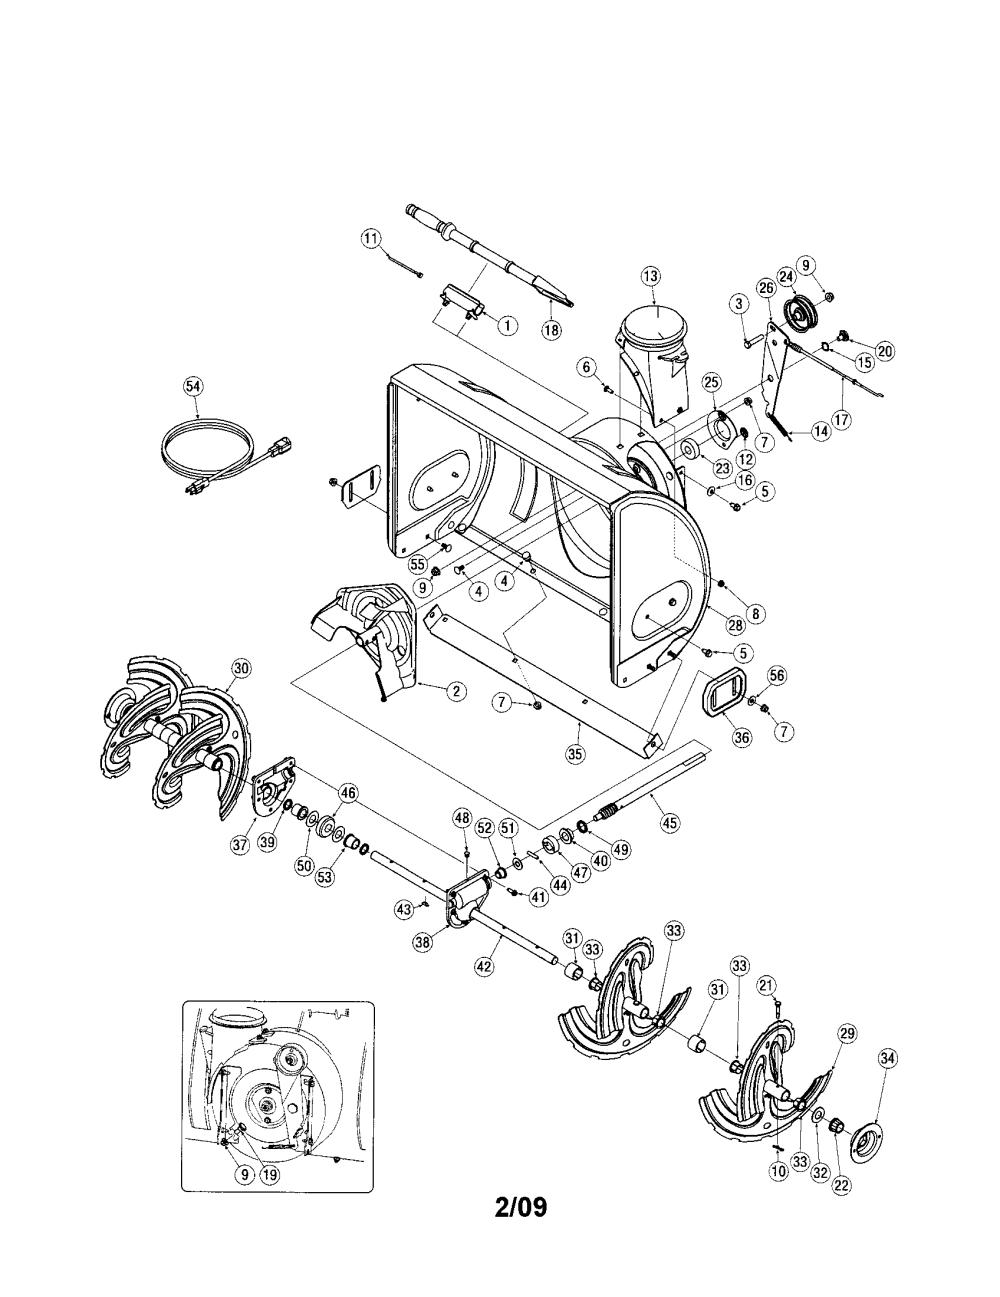 medium resolution of diagram of yard man snowblower wiring diagram features diagram of yard man snowblower